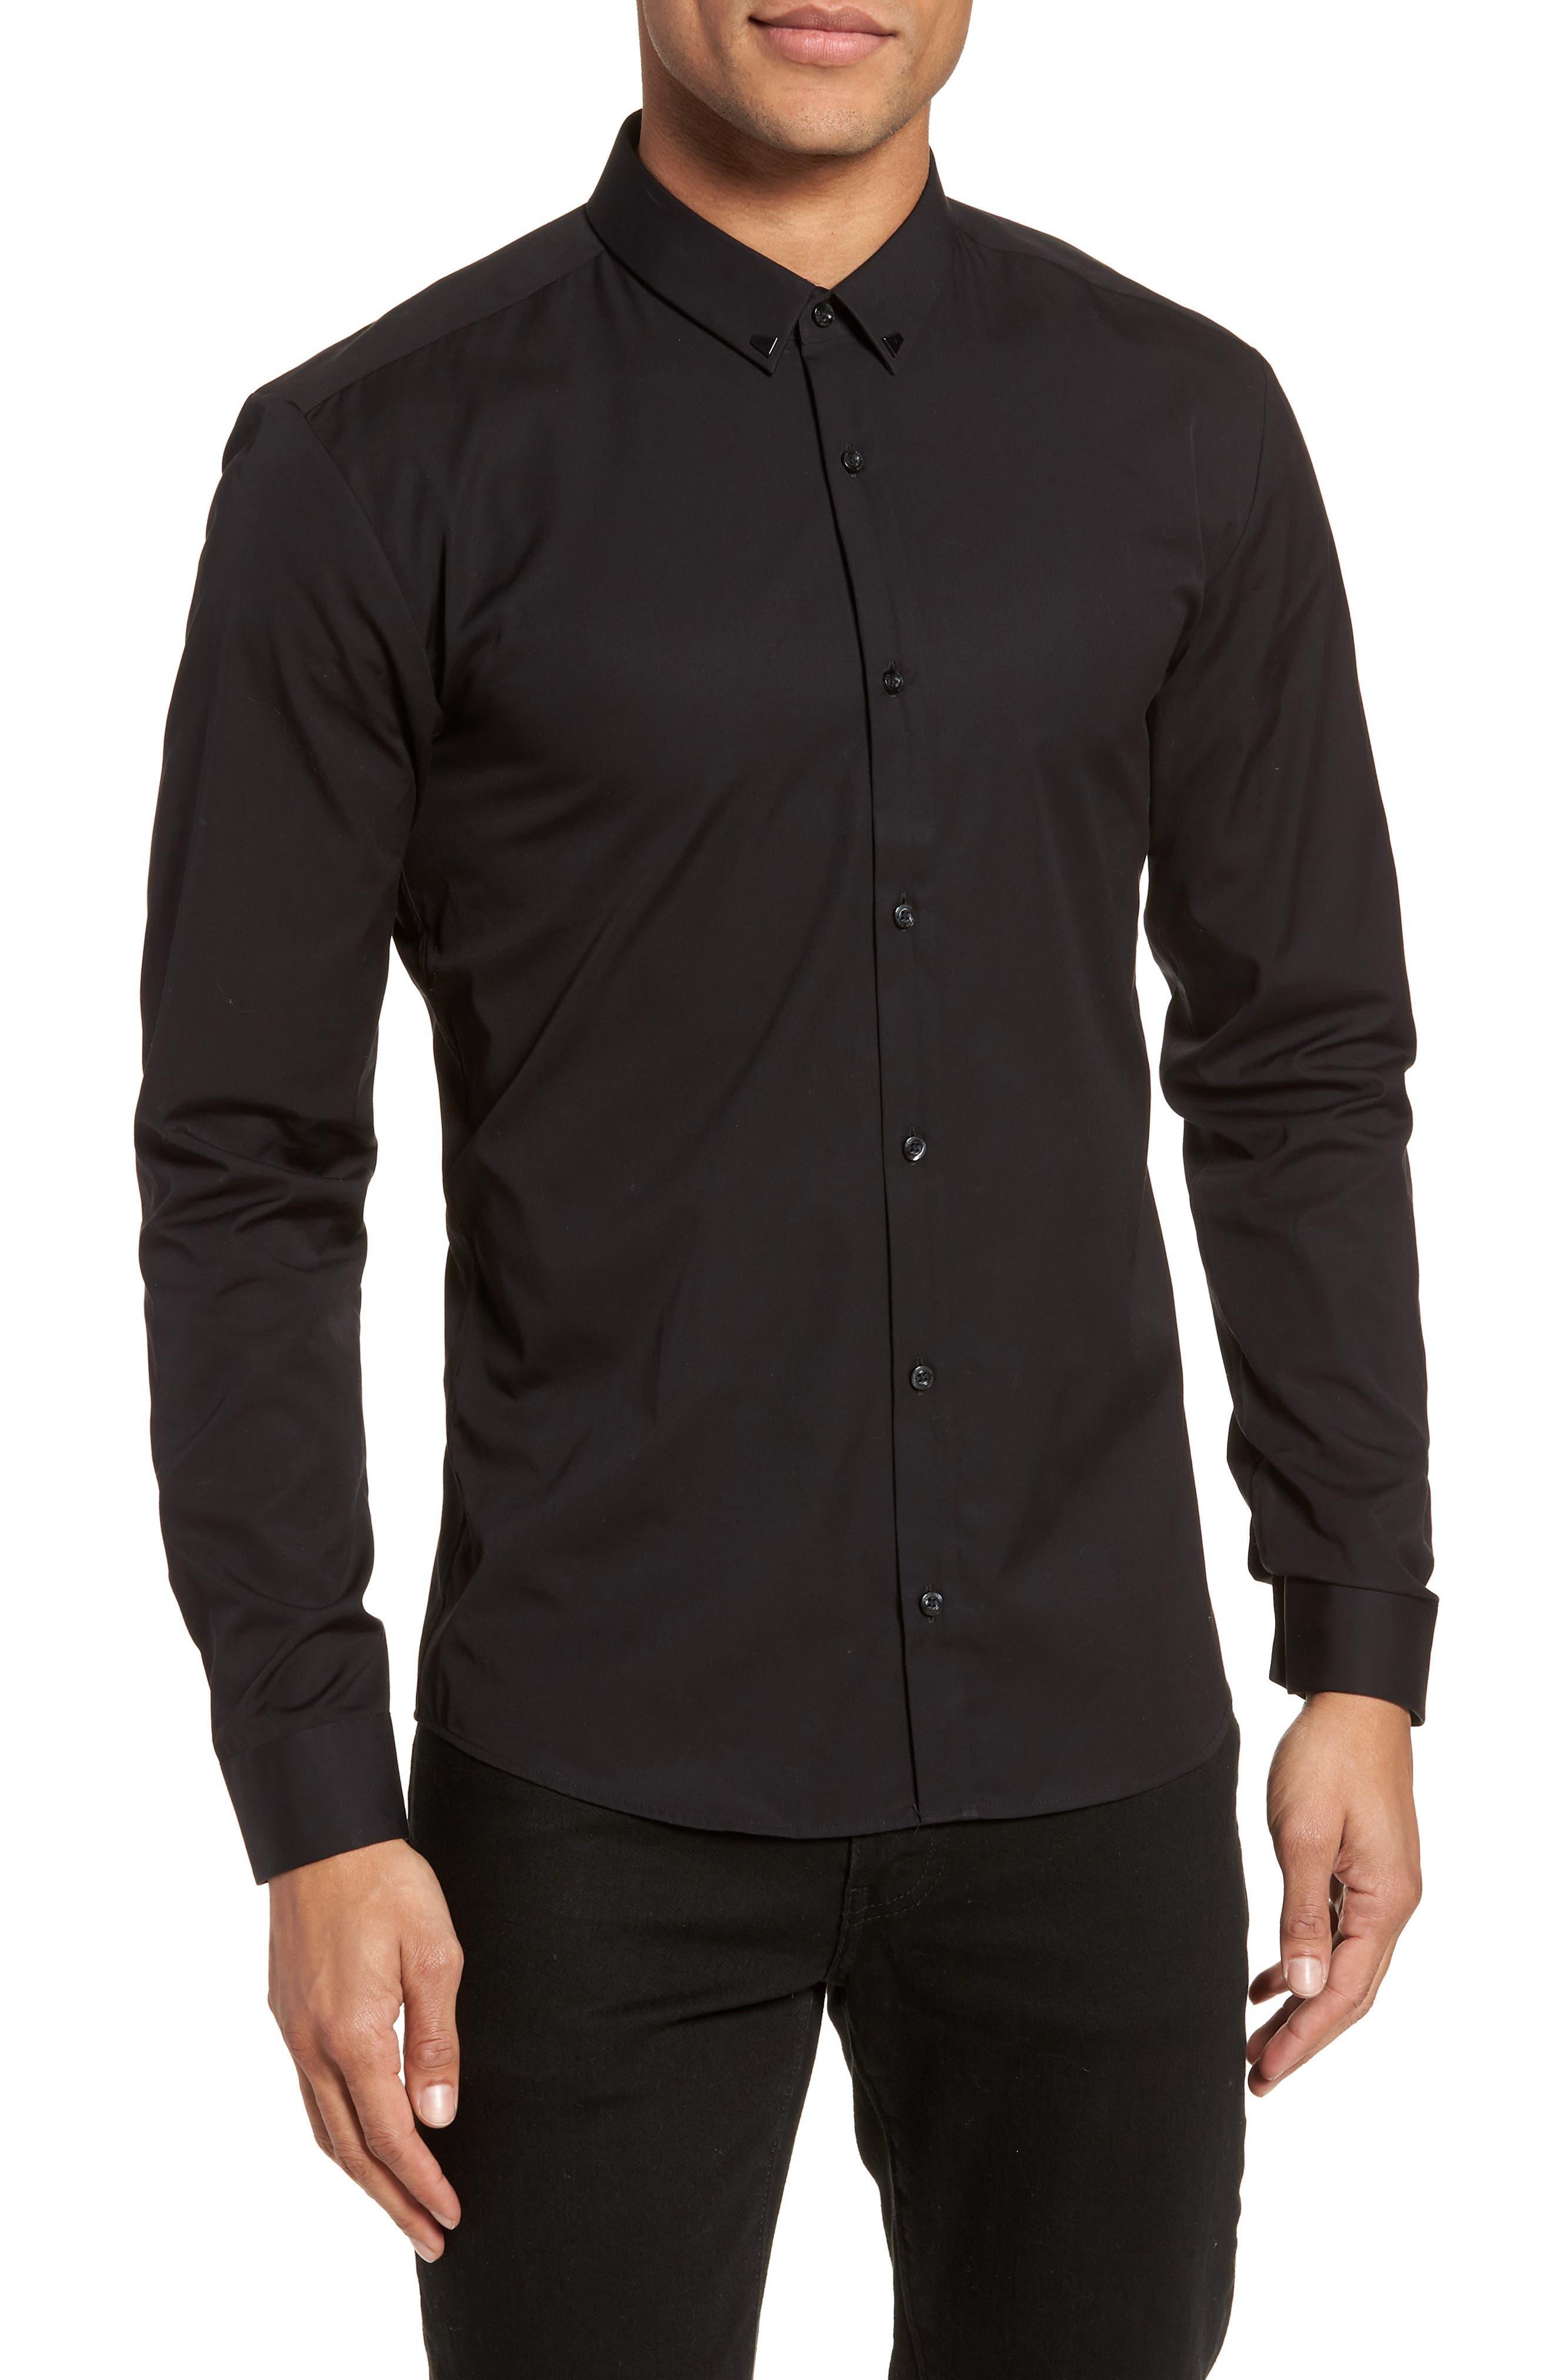 Alternate Image 1 Selected - HUGO Ero Slim Fit Solid Cotton Sport Shirt